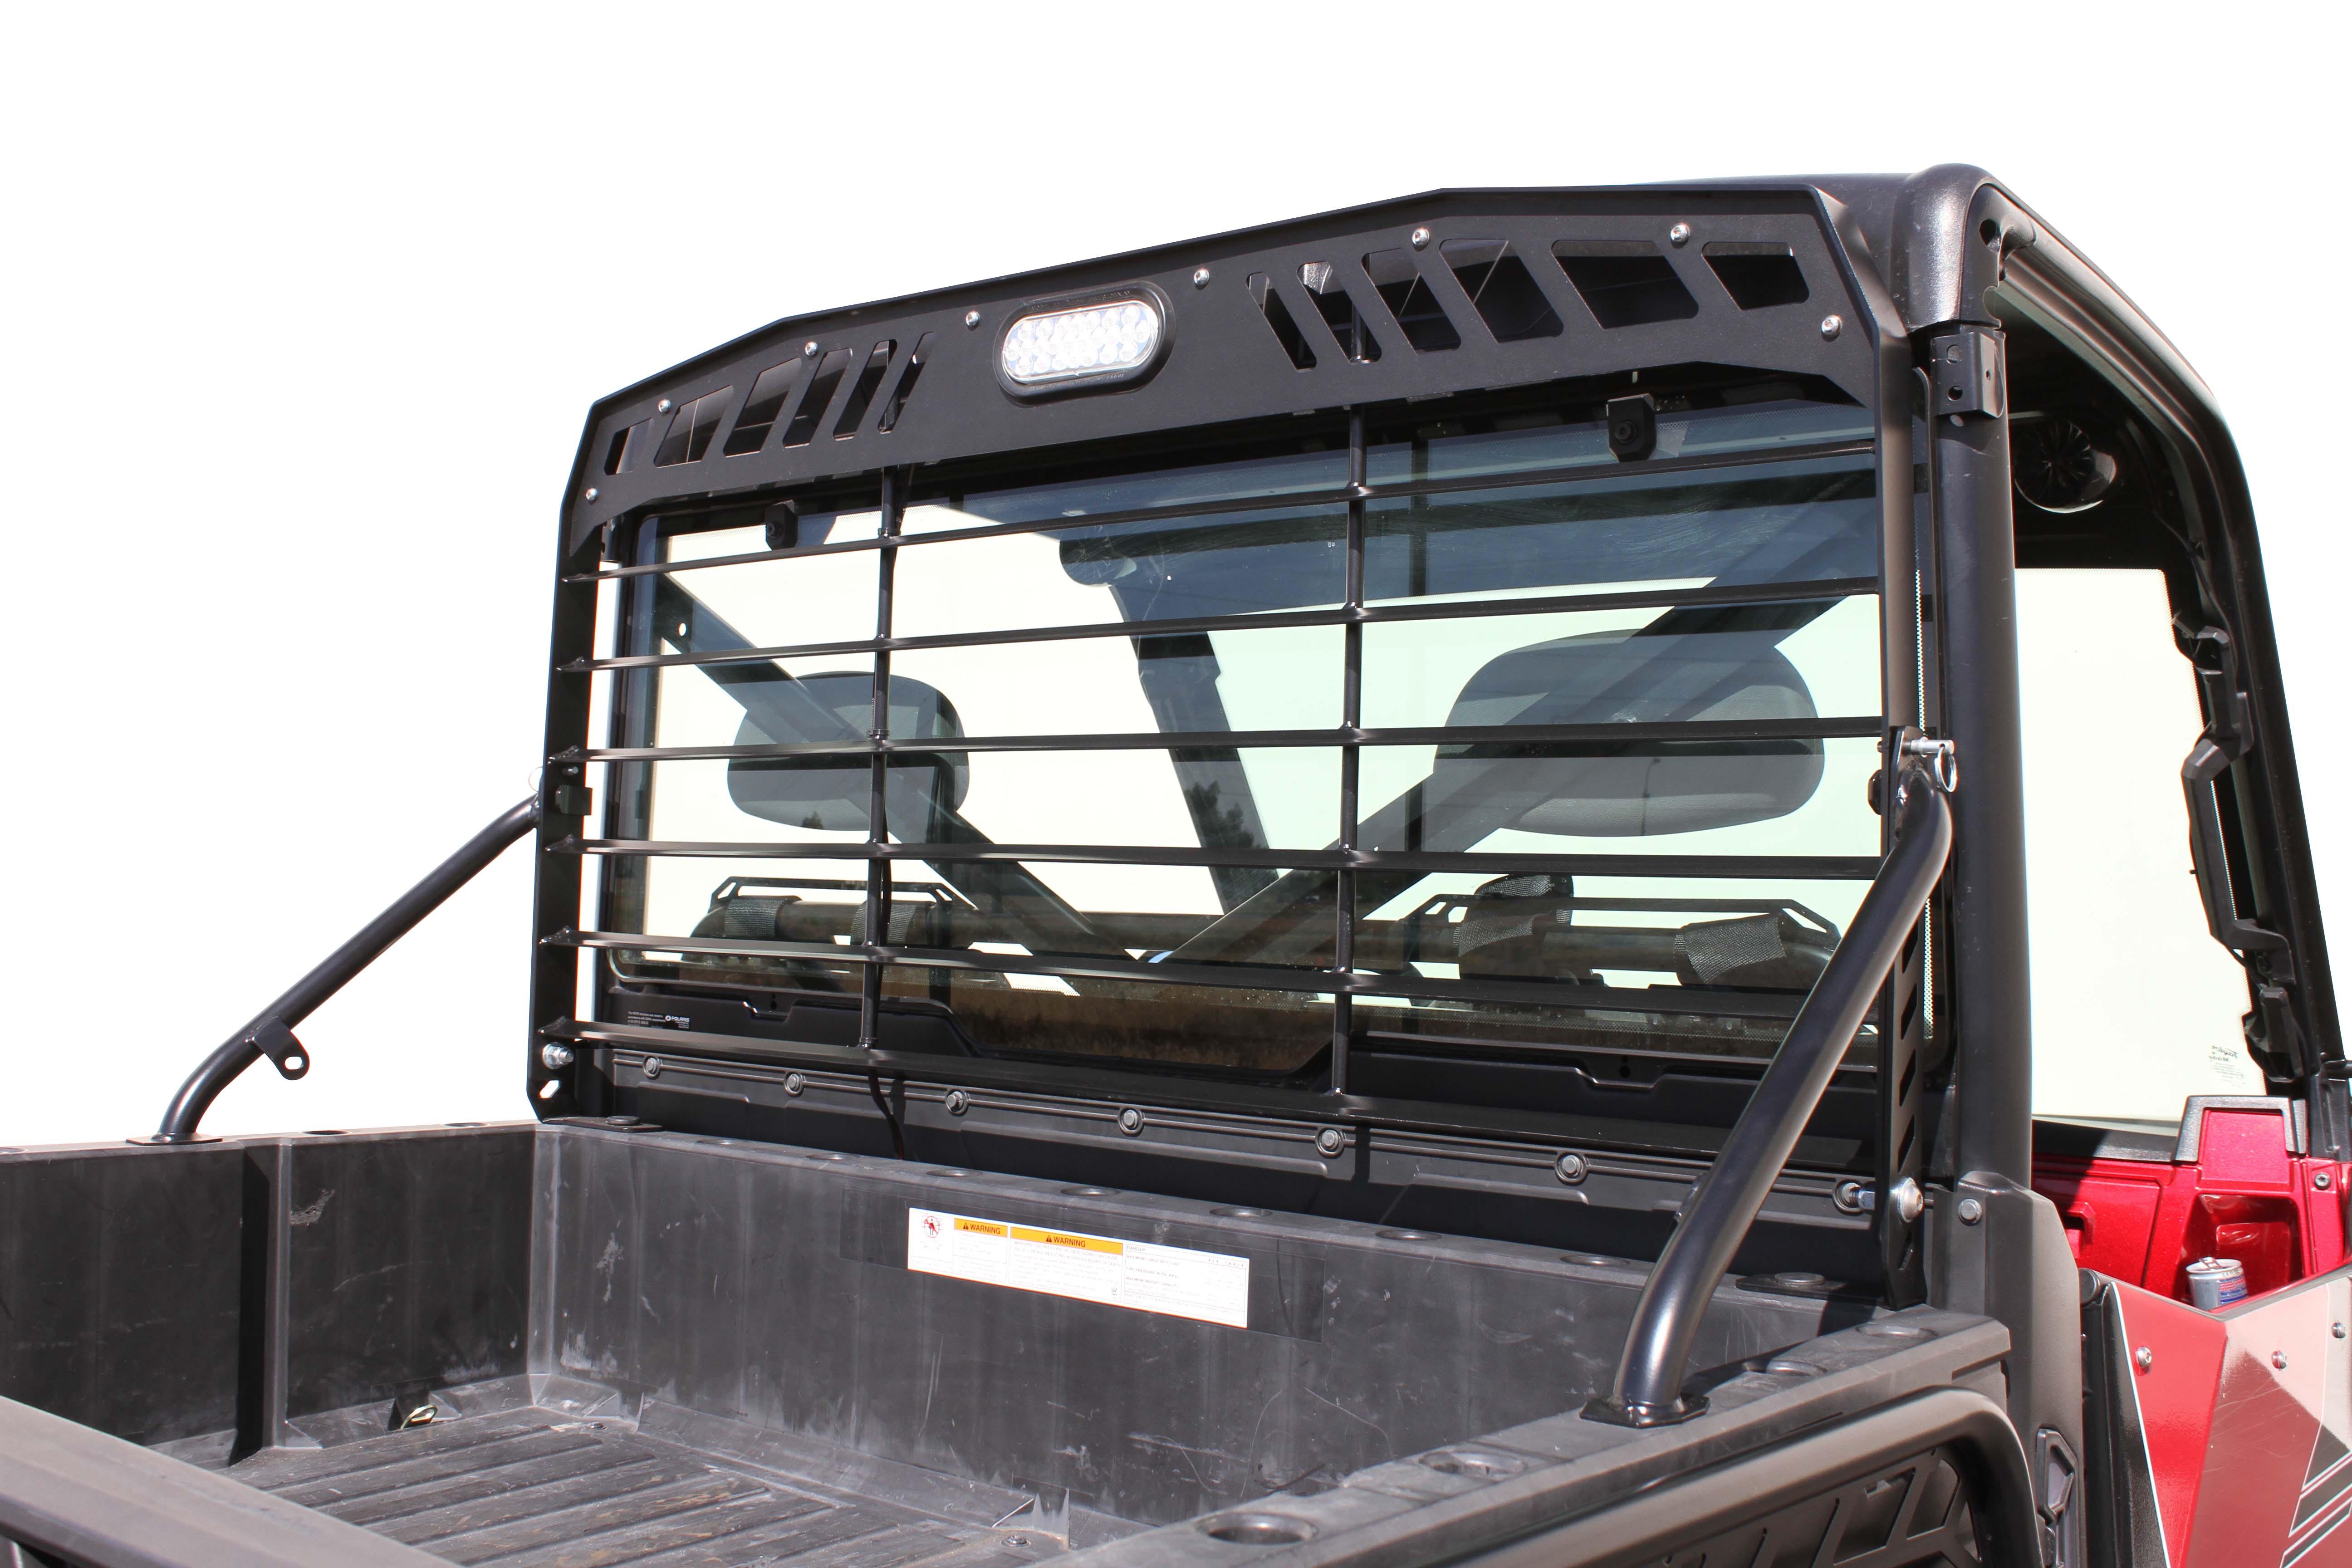 toyota fab headache rack tundra accessories bed fours truck